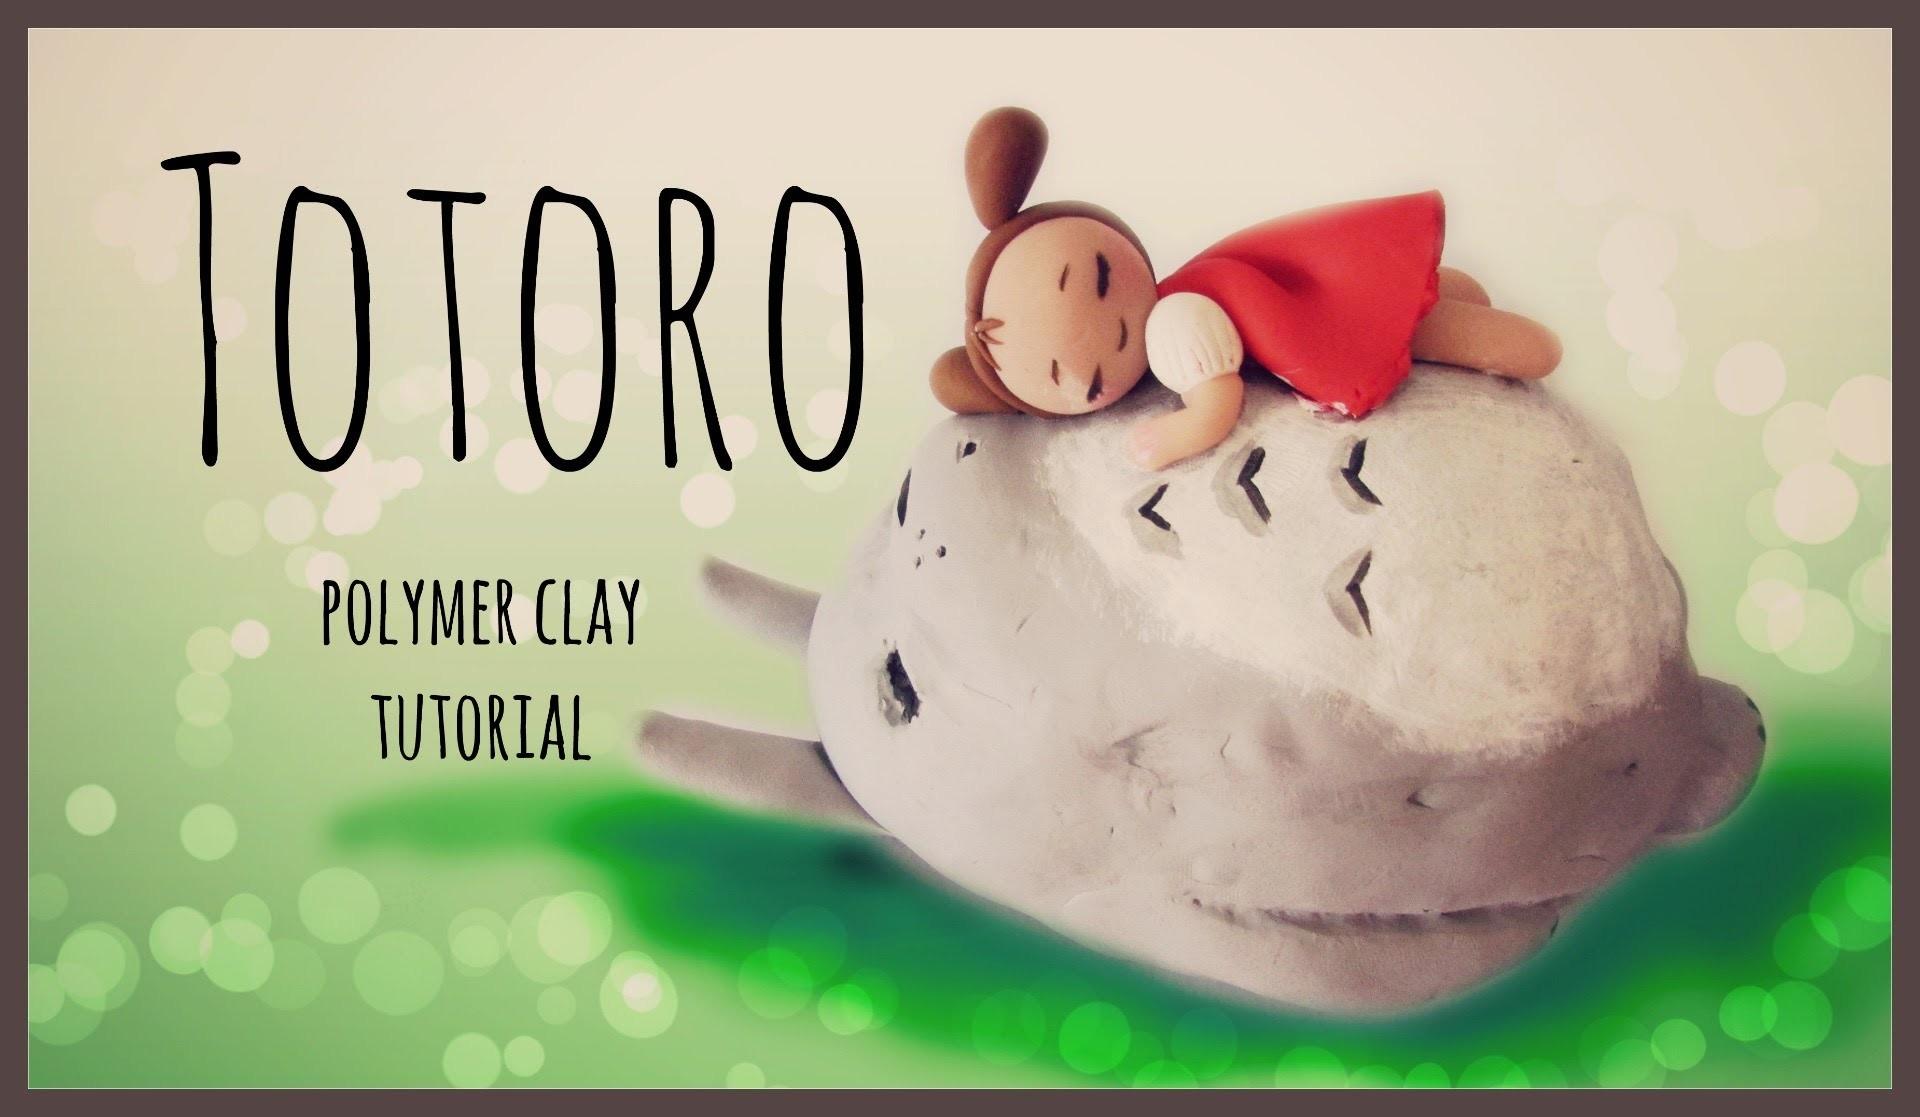 Totoro - Studio Ghibli Series - Polymer Clay Tutorial